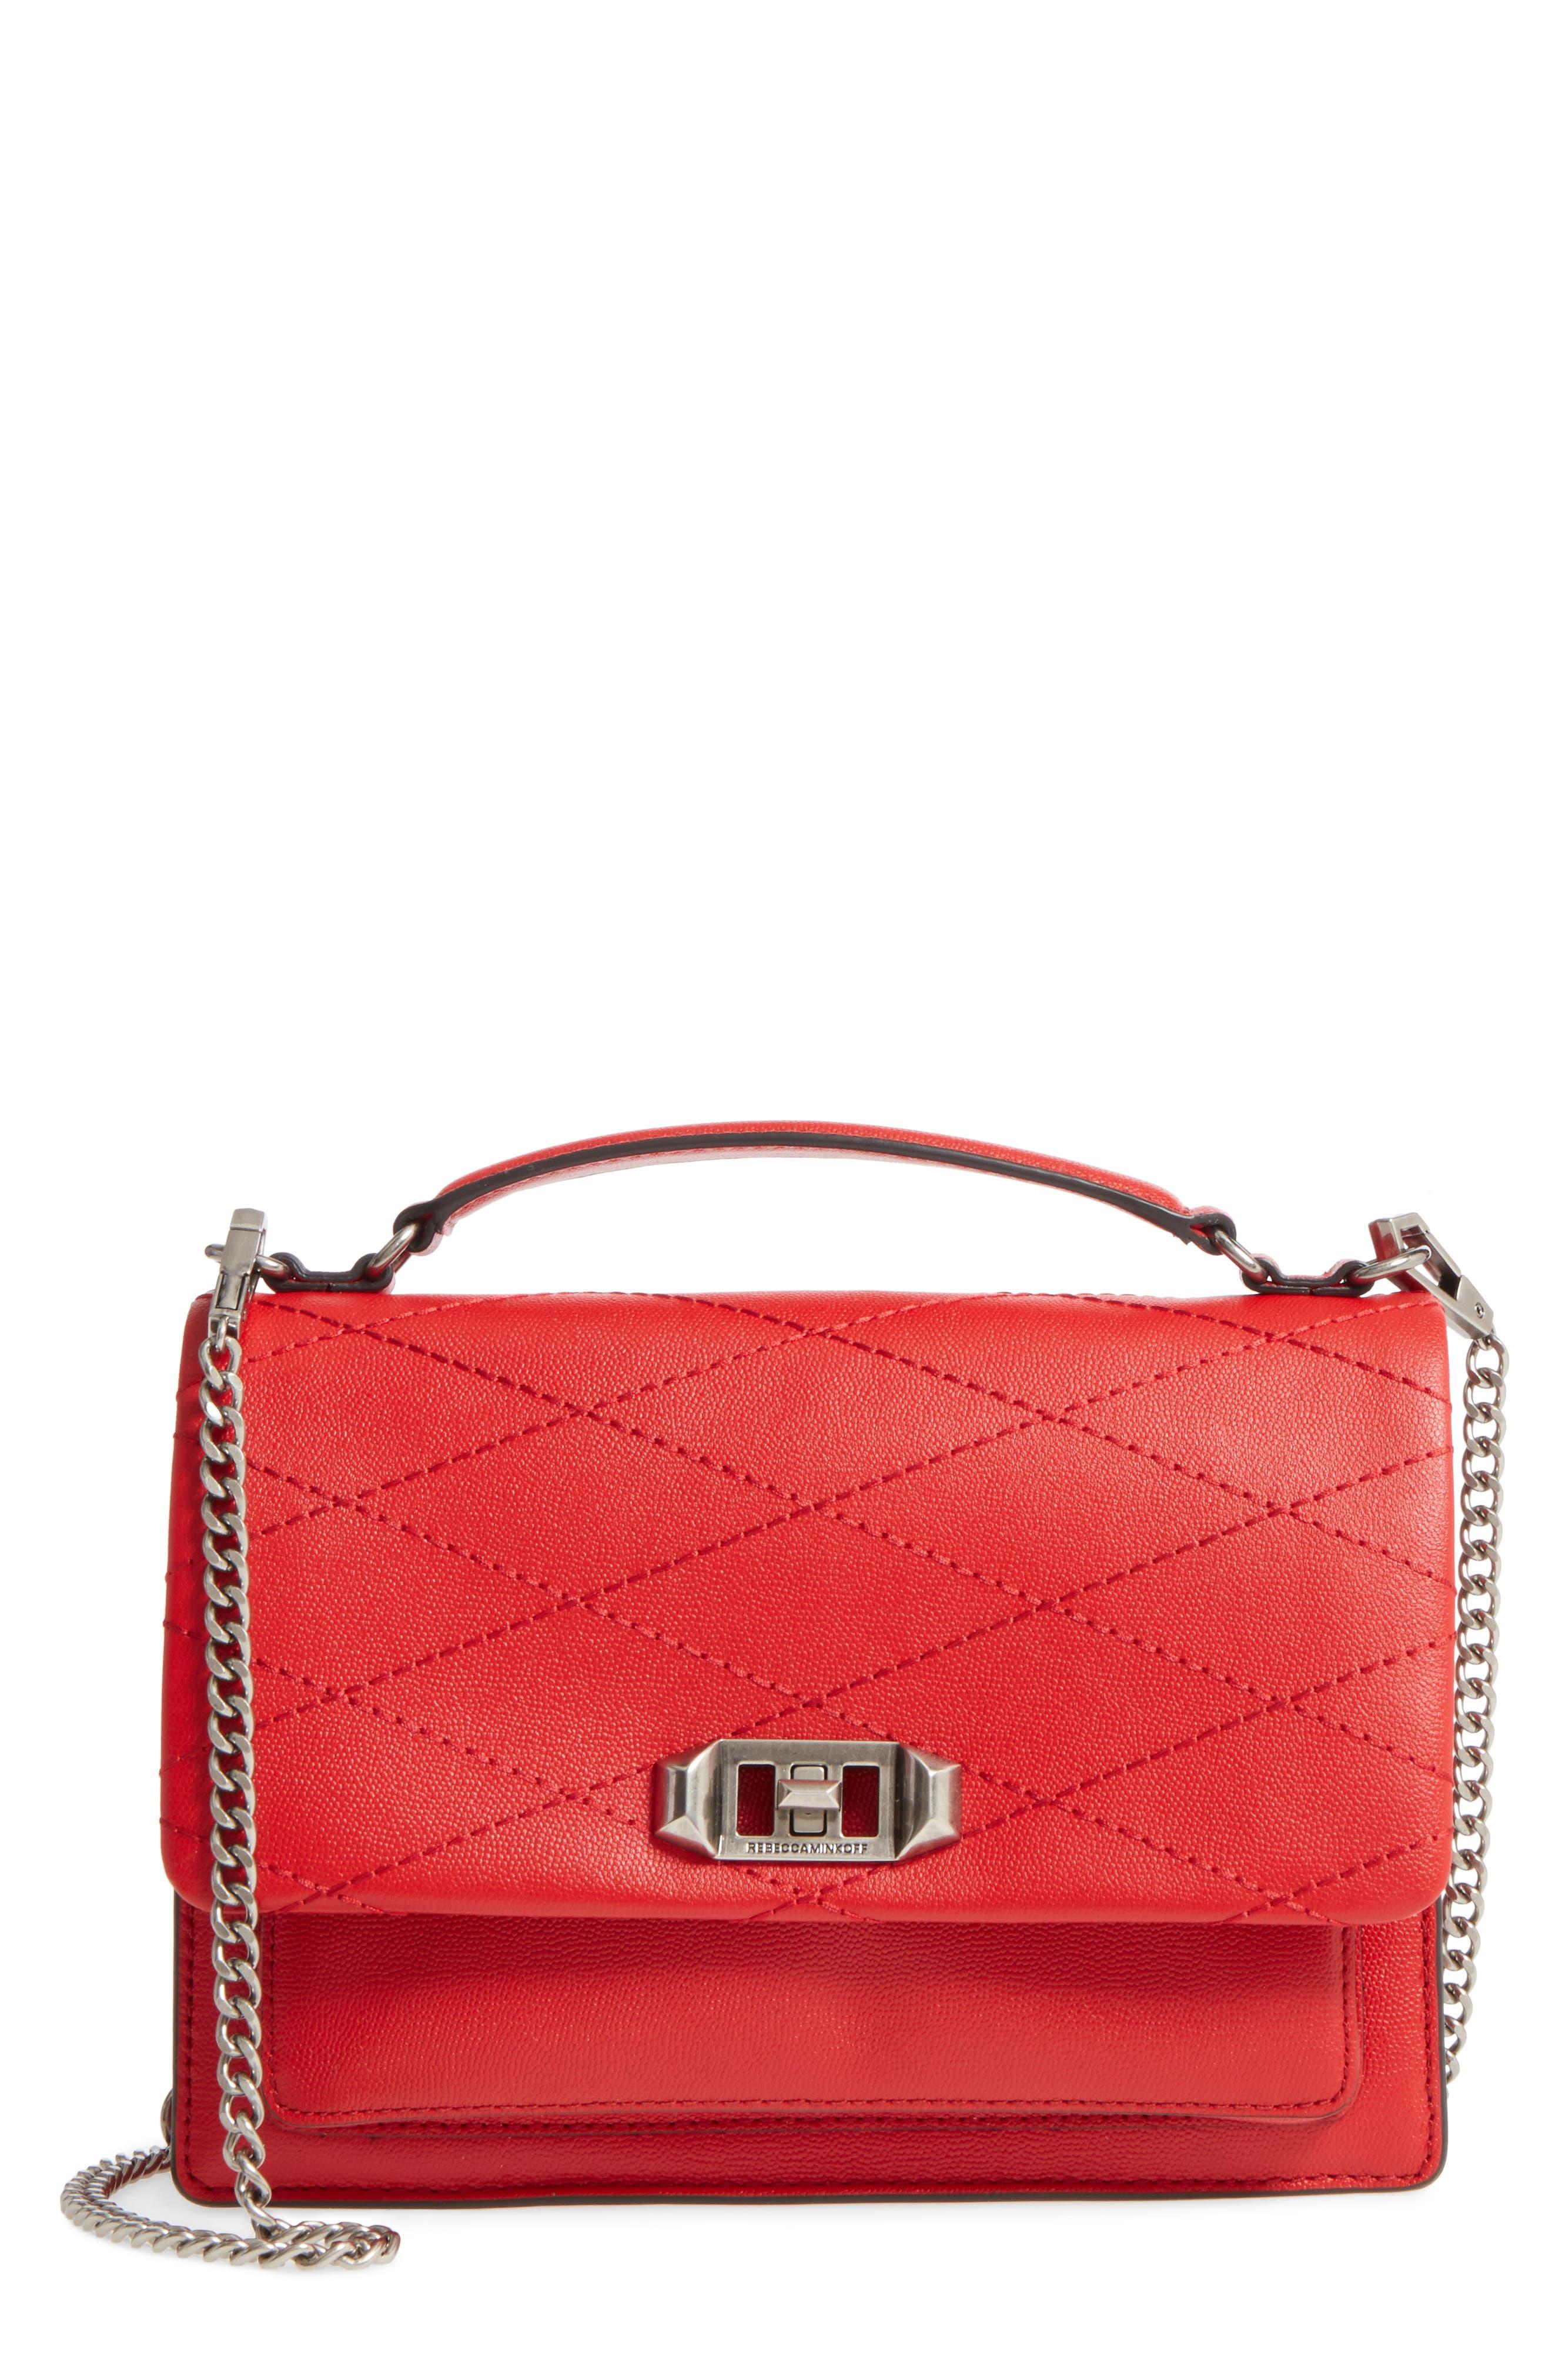 Medium Je T'aime Convertible Leather Crossbody Bag,                             Main thumbnail 7, color,